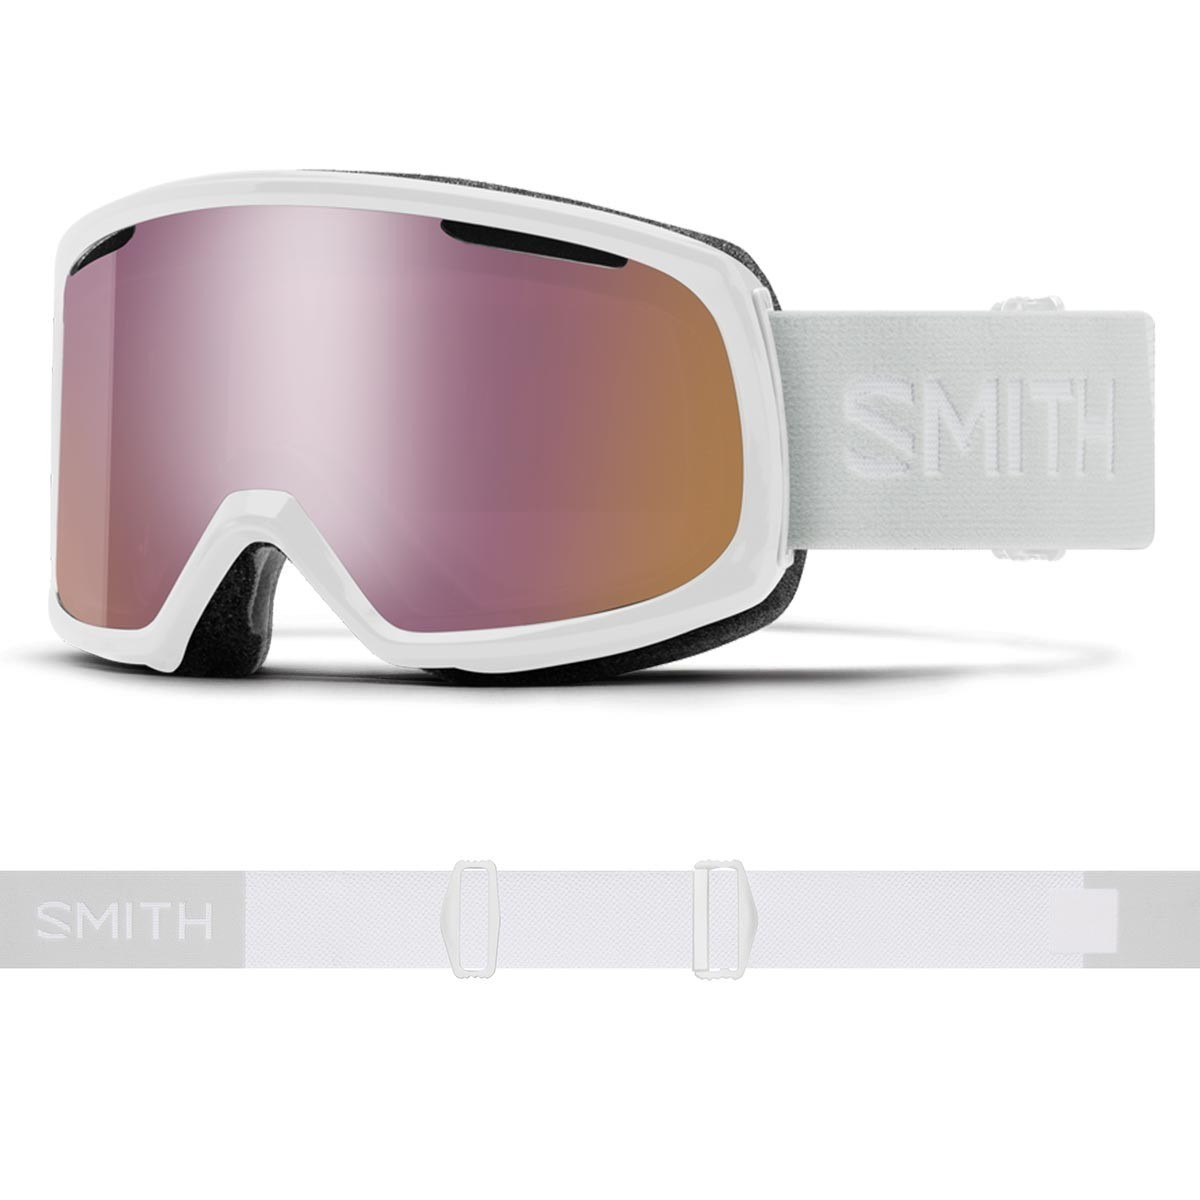 SMITH RIOT white vapor | S2 CHROMAPOP Everyday RoseGold Mirror - Изображение - AQUAMATRIX